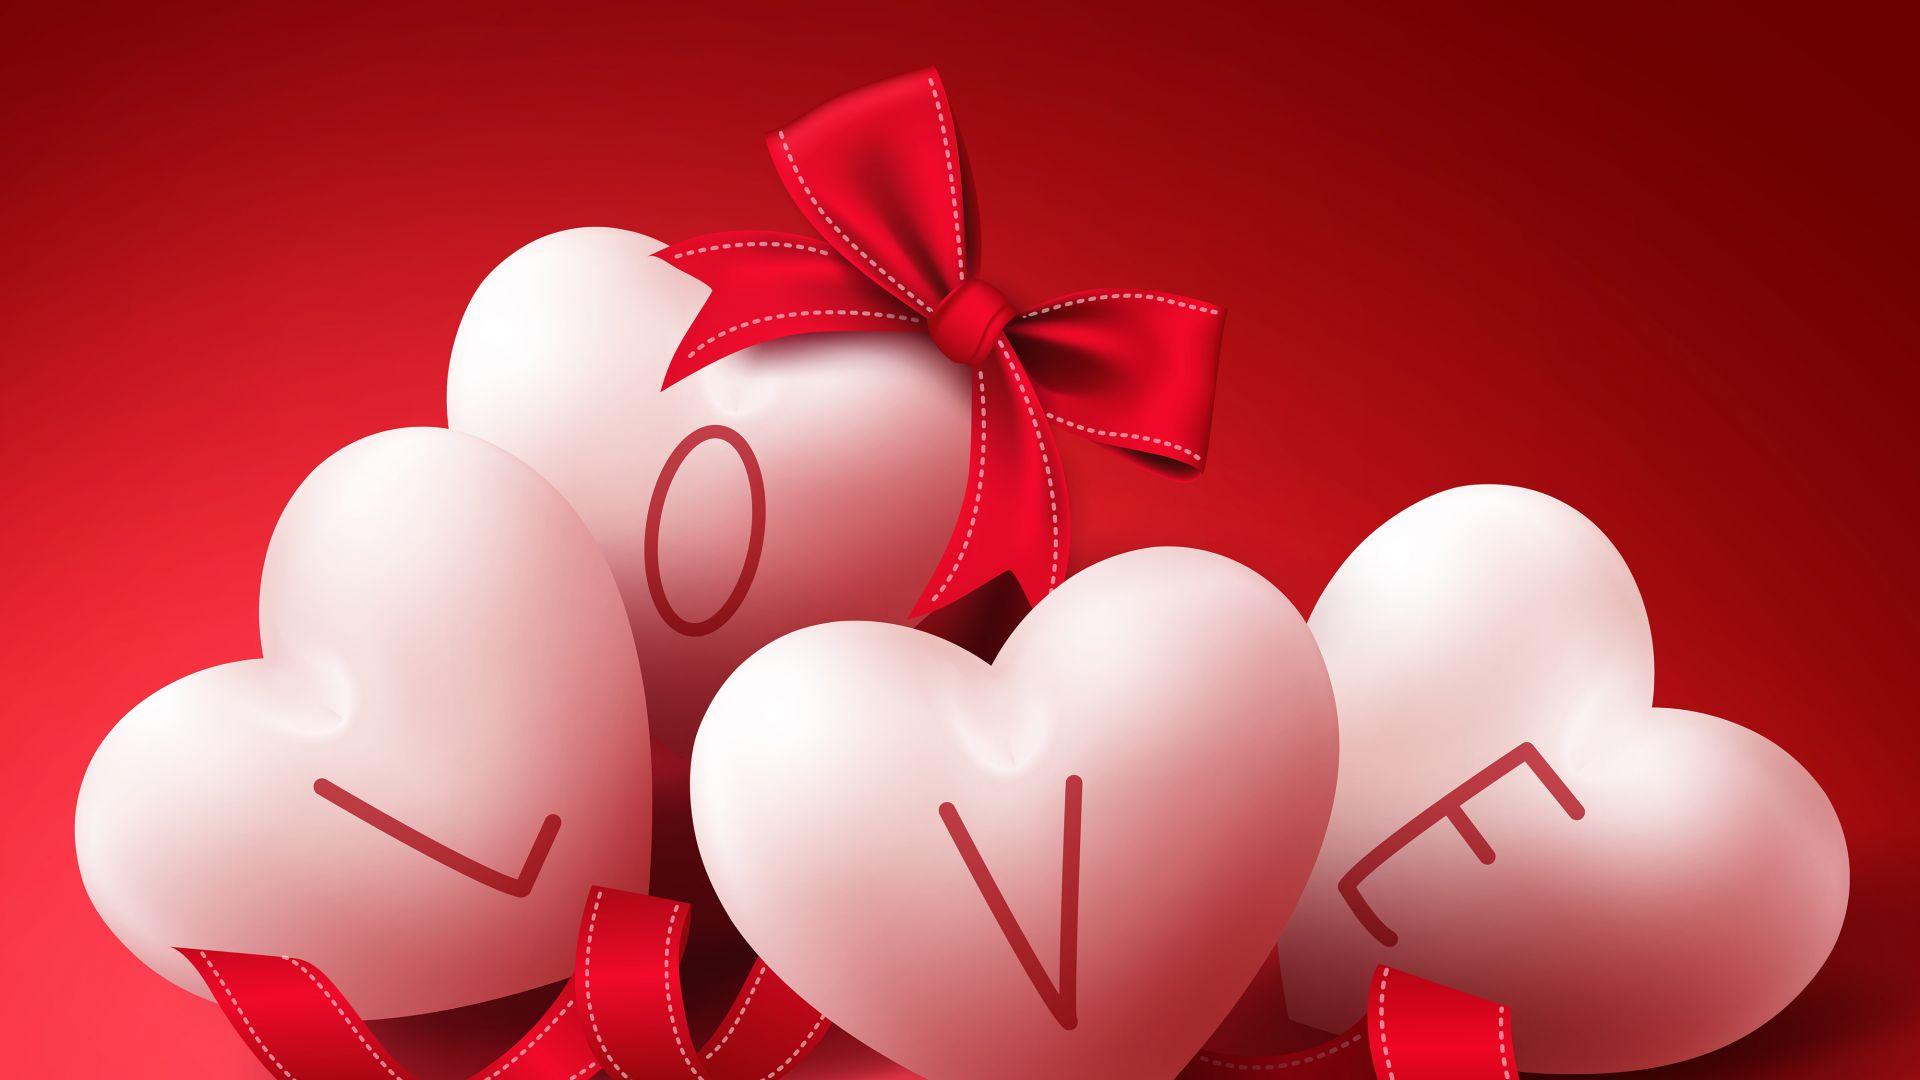 картинка четыре сердца размер